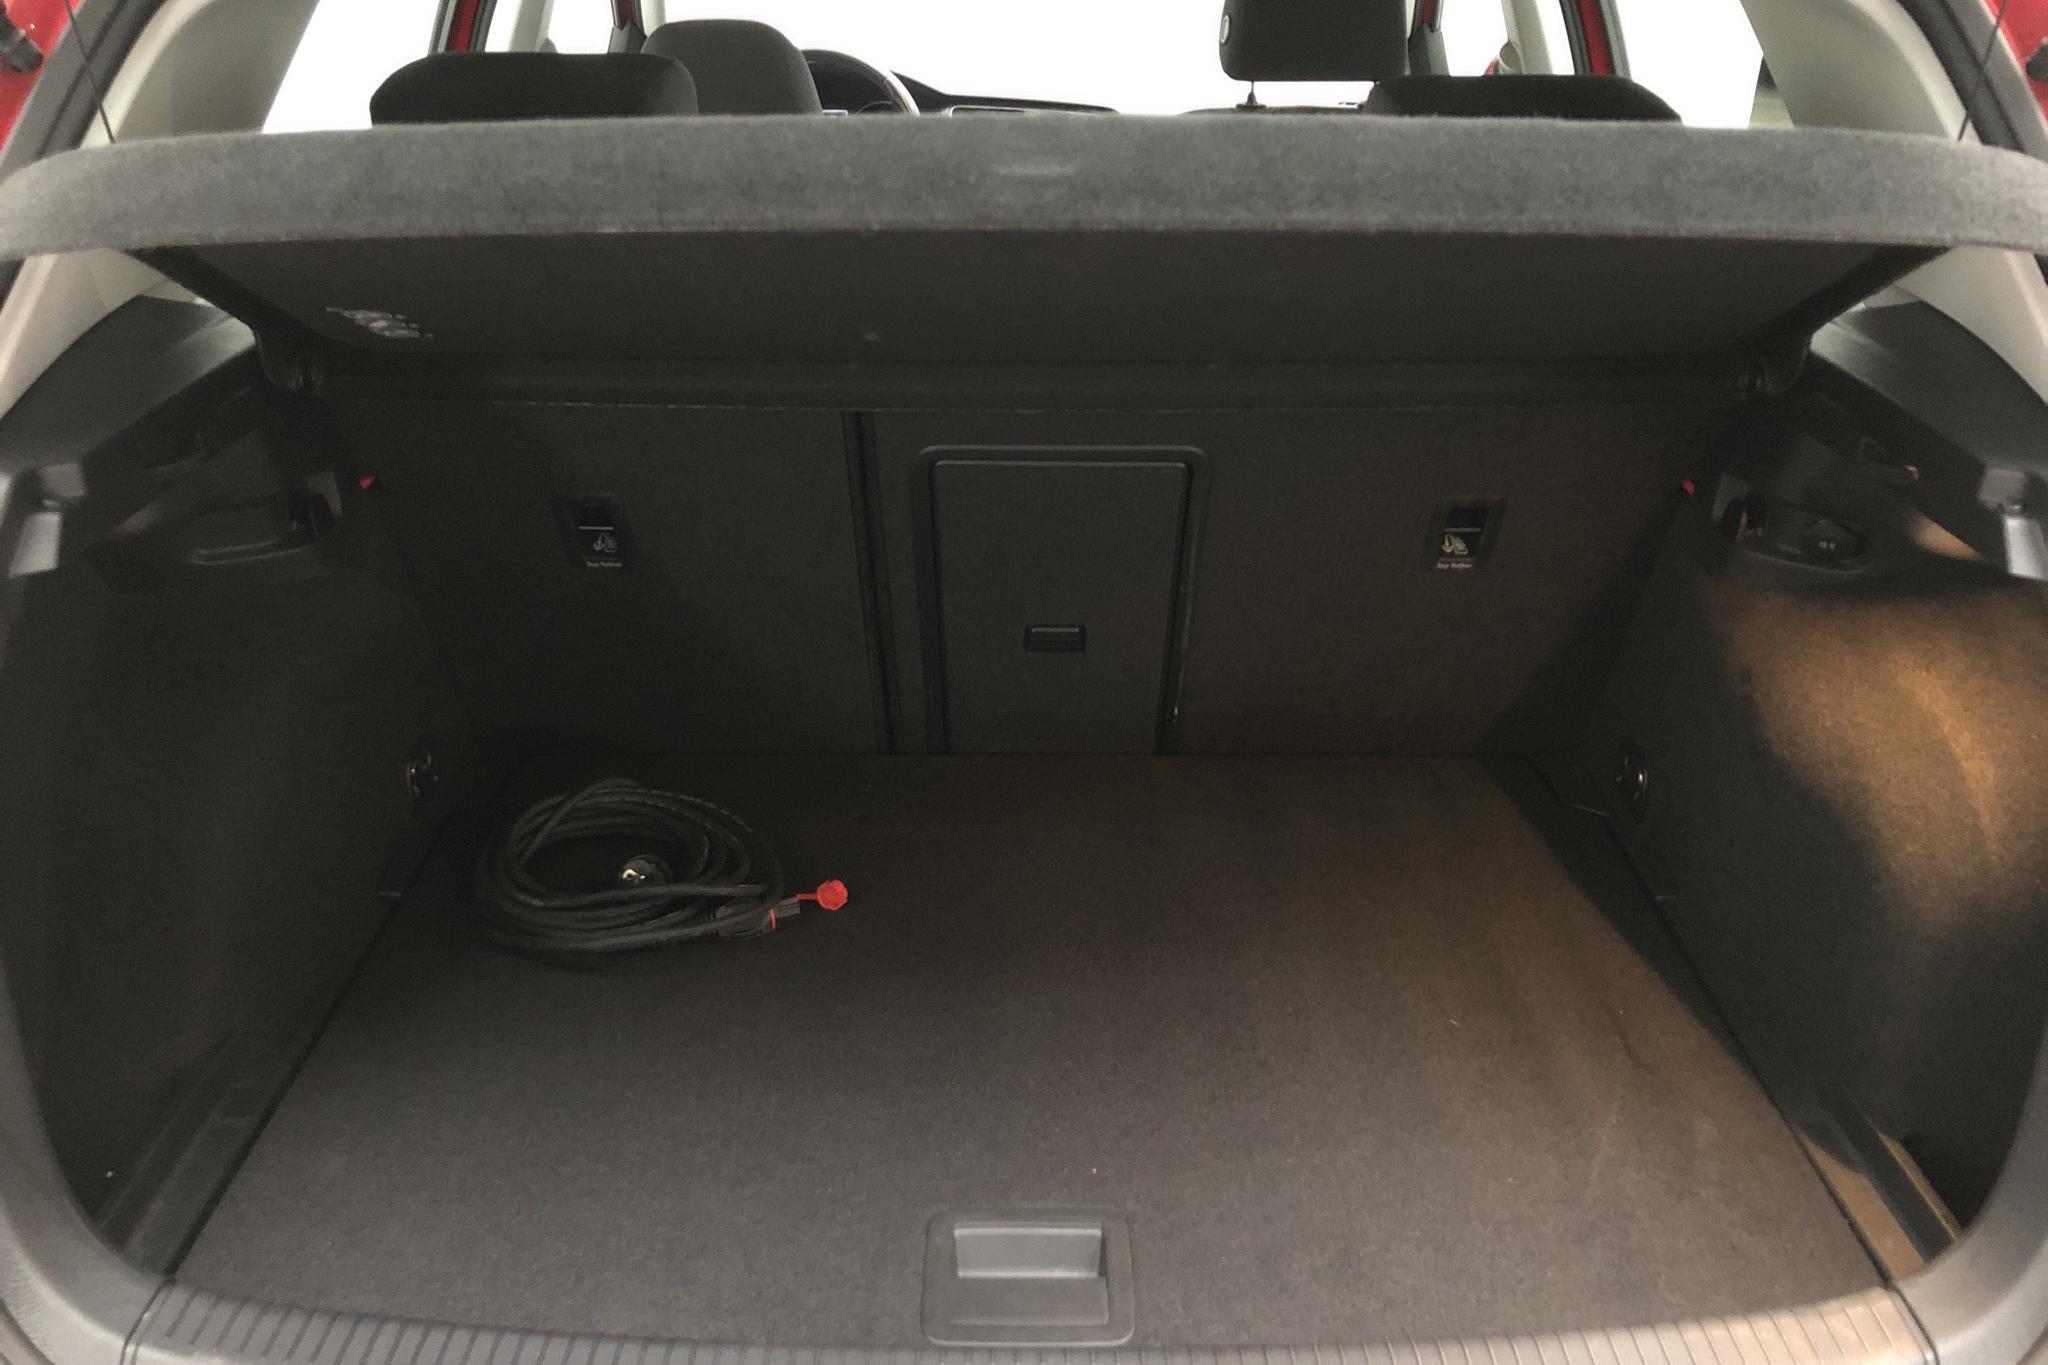 VW Golf VII 1.4 TSI Multifuel 5dr (125hk) - 50 750 km - Manual - red - 2018